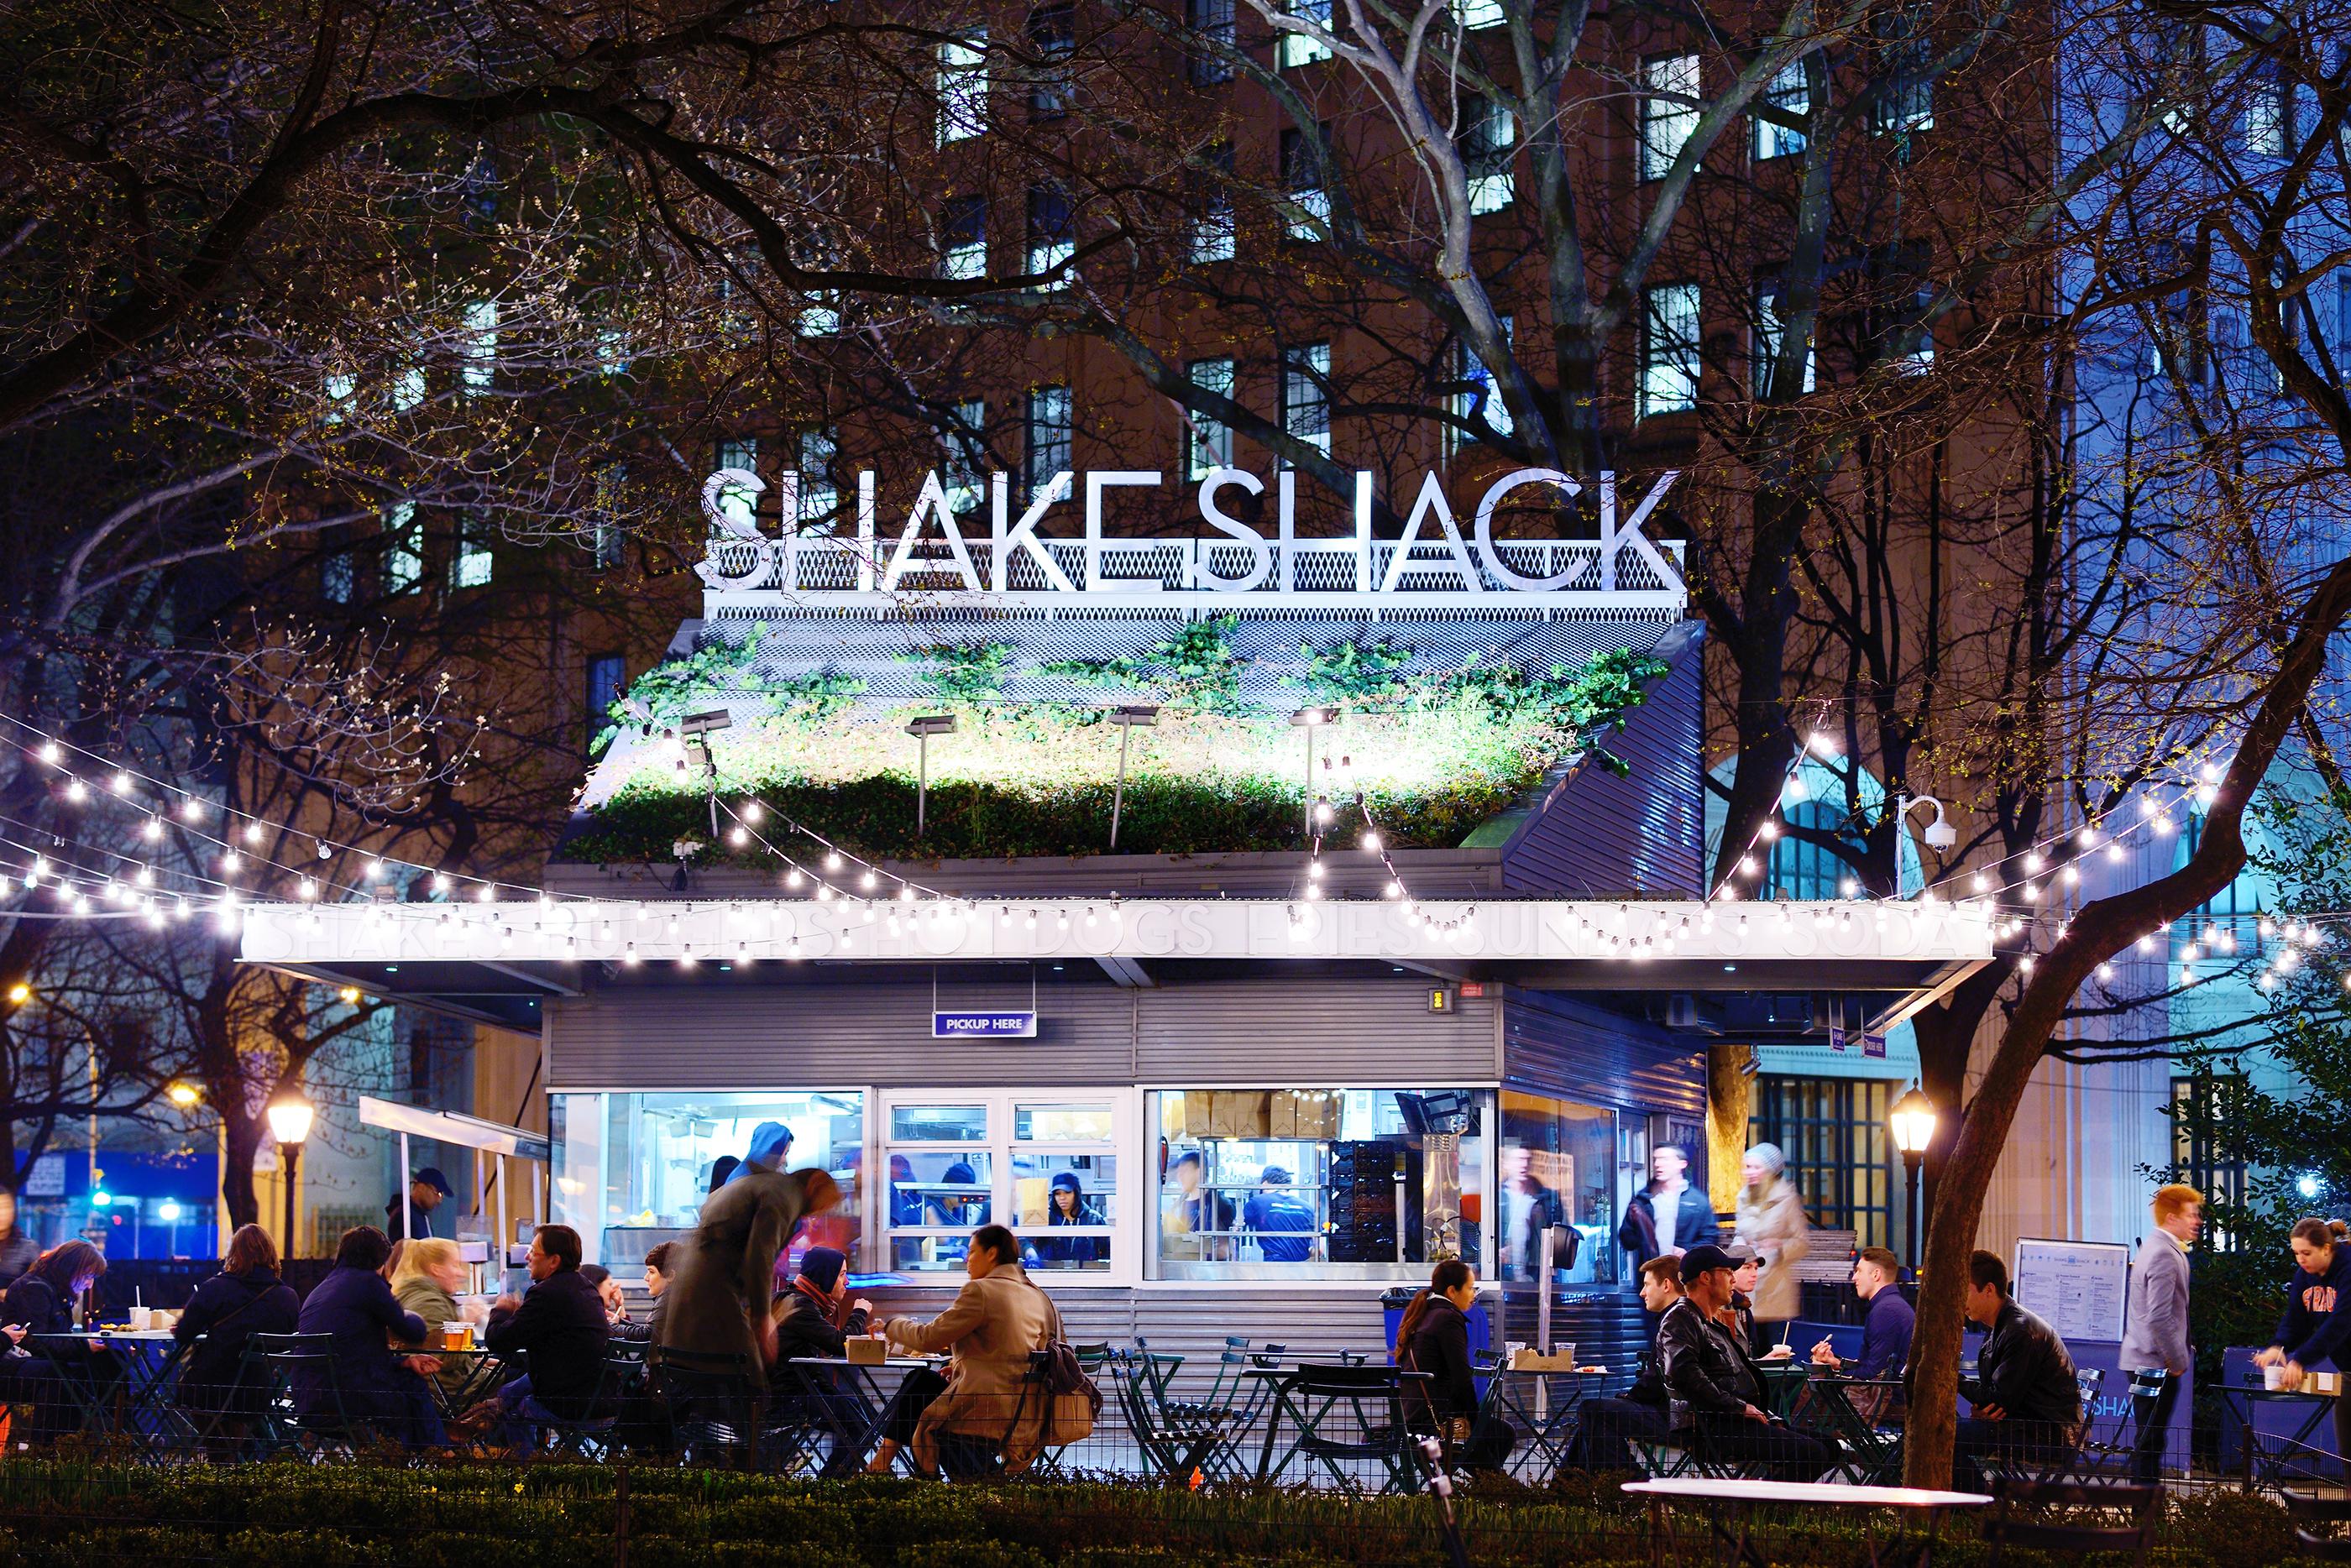 180430-fast-casual-restaurants-shake-shack